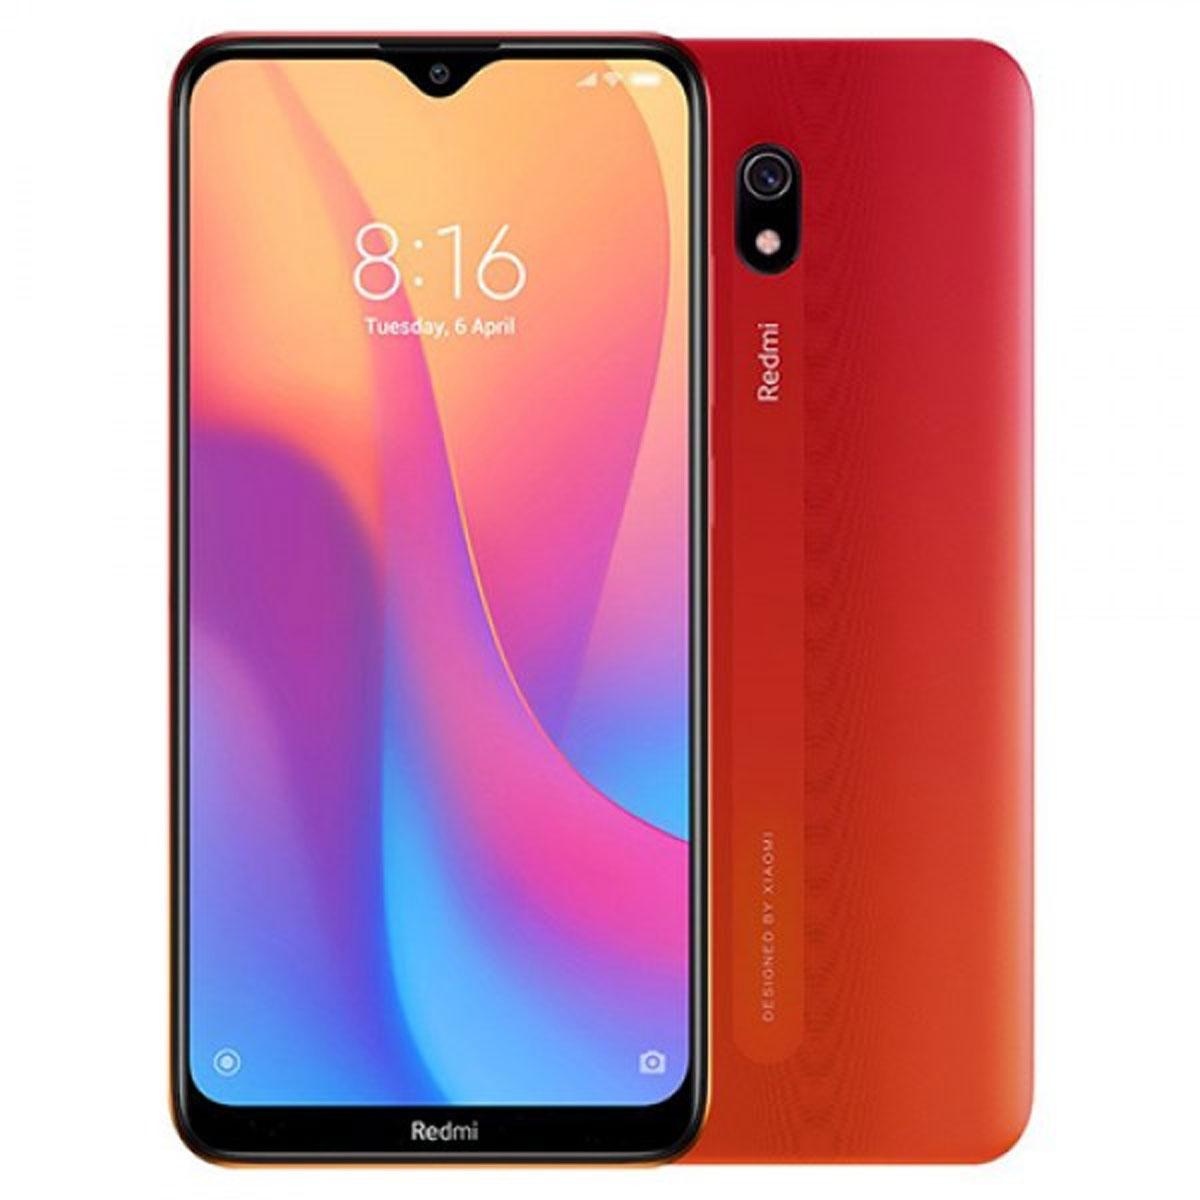 Latest Price List of Xiaomi Mobile Phones in Pakistan | PriceOye